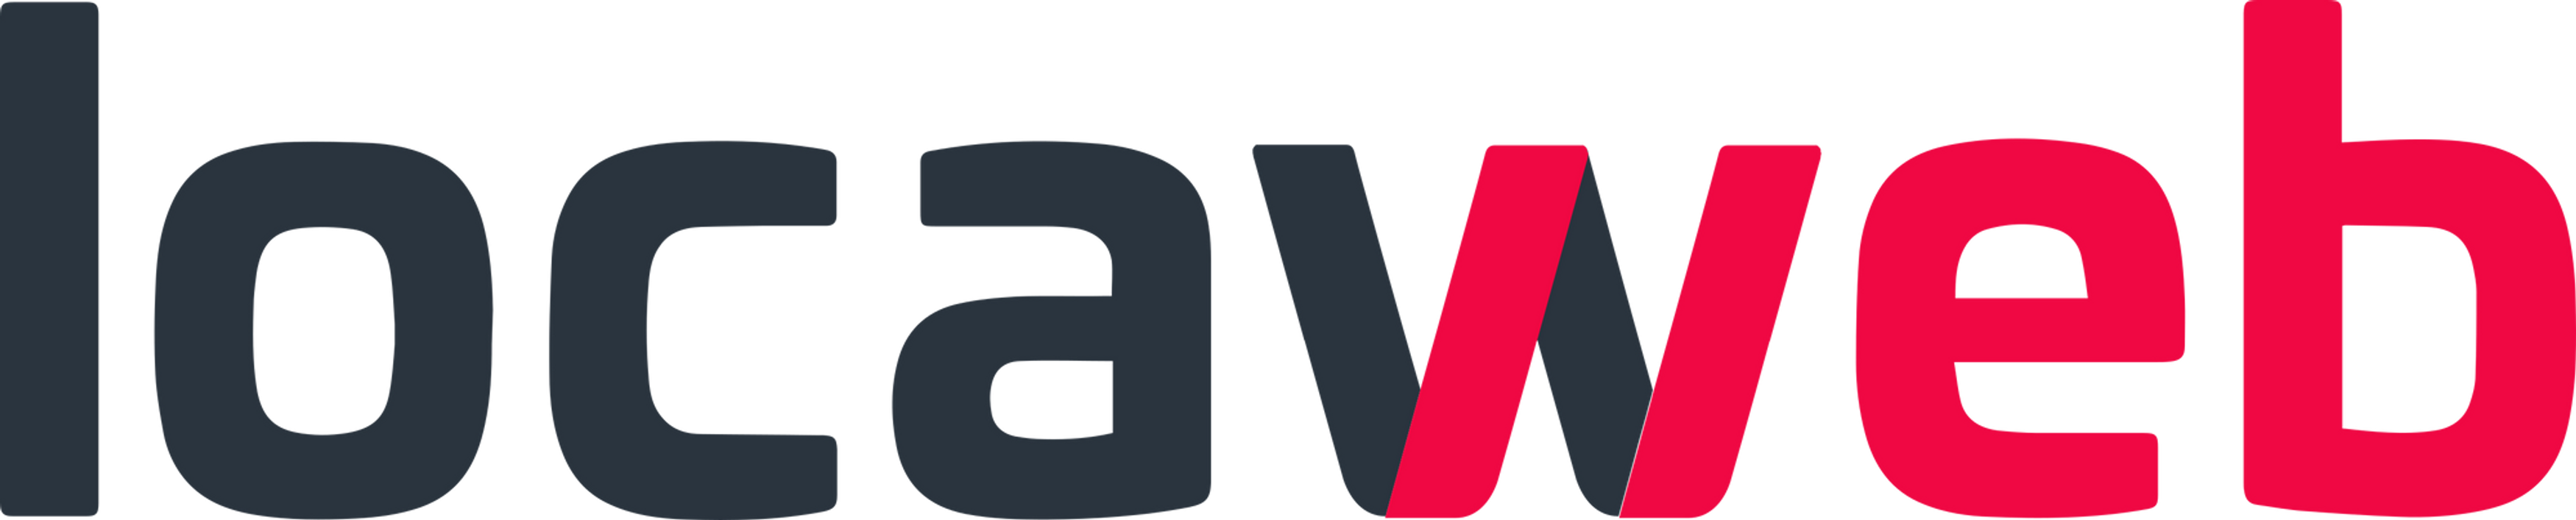 locaweb-logo.png